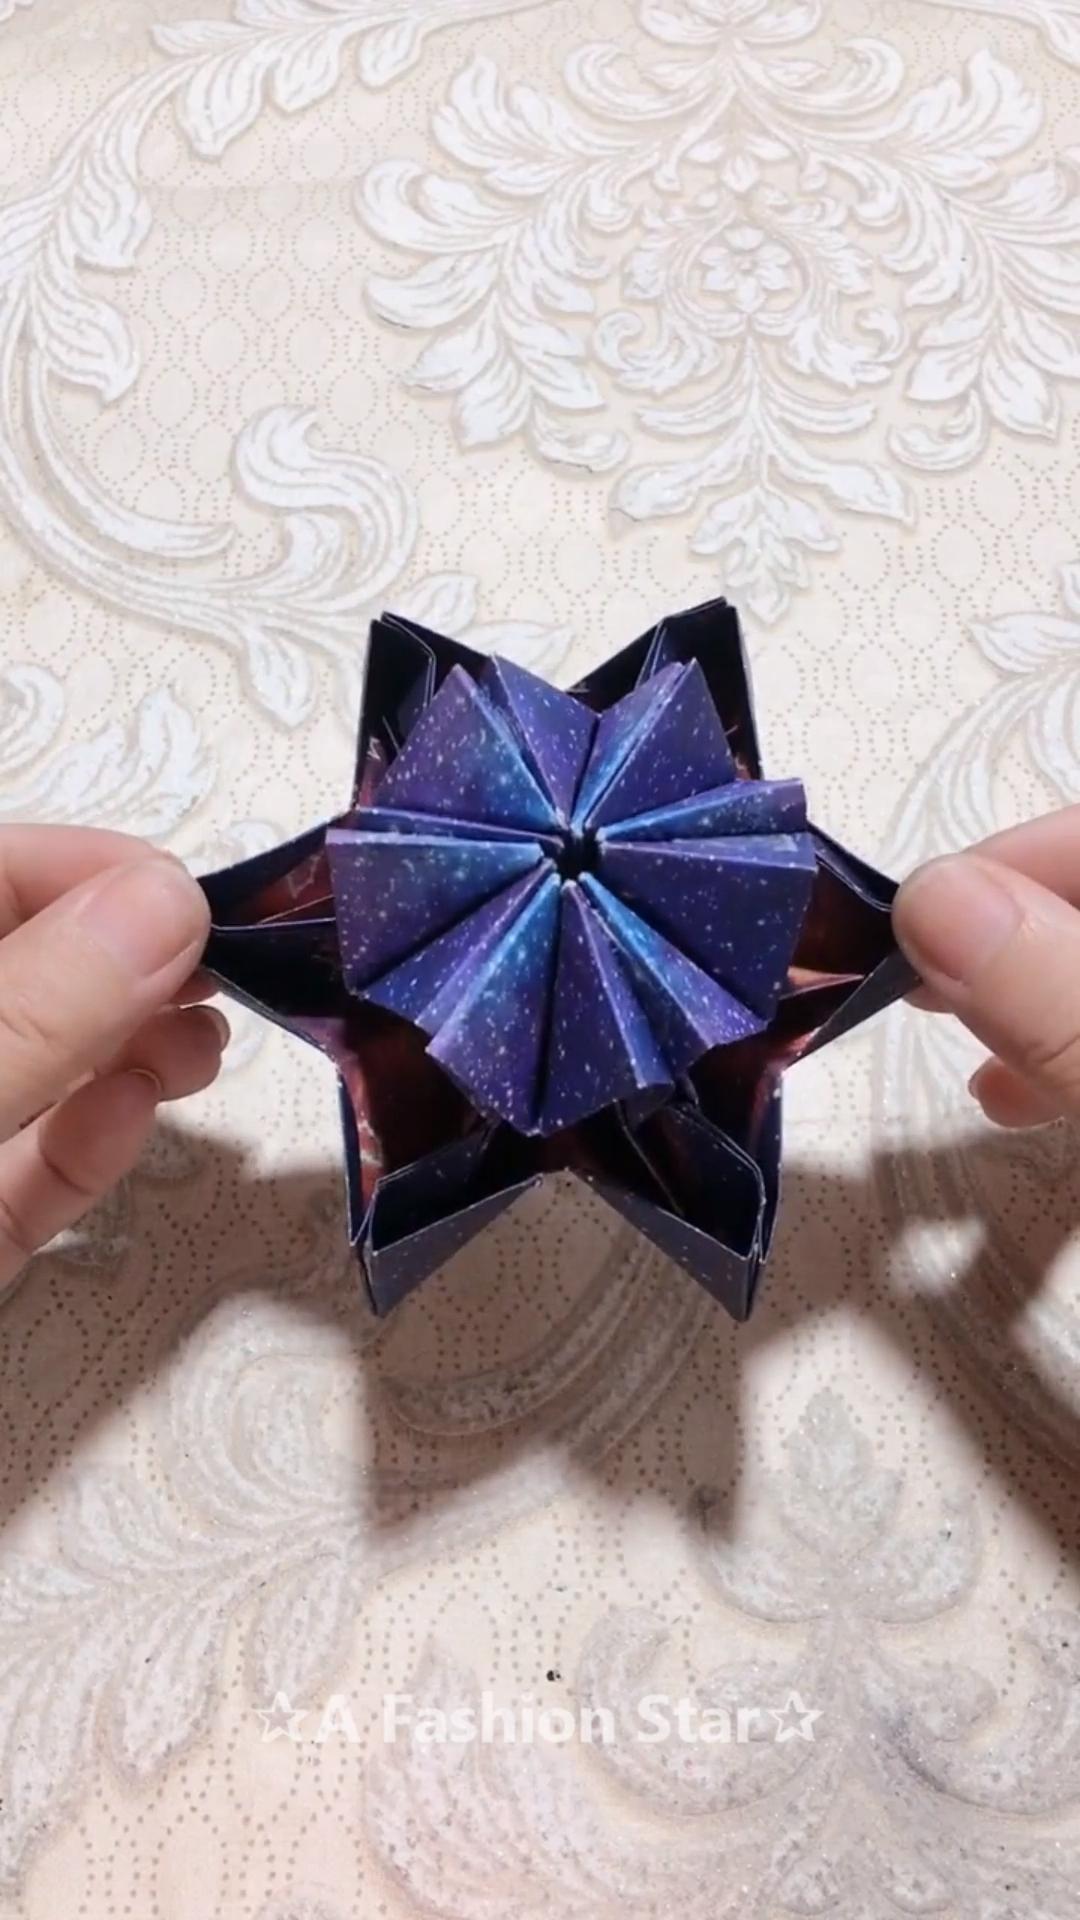 14 diy projects Paper decoration ideas